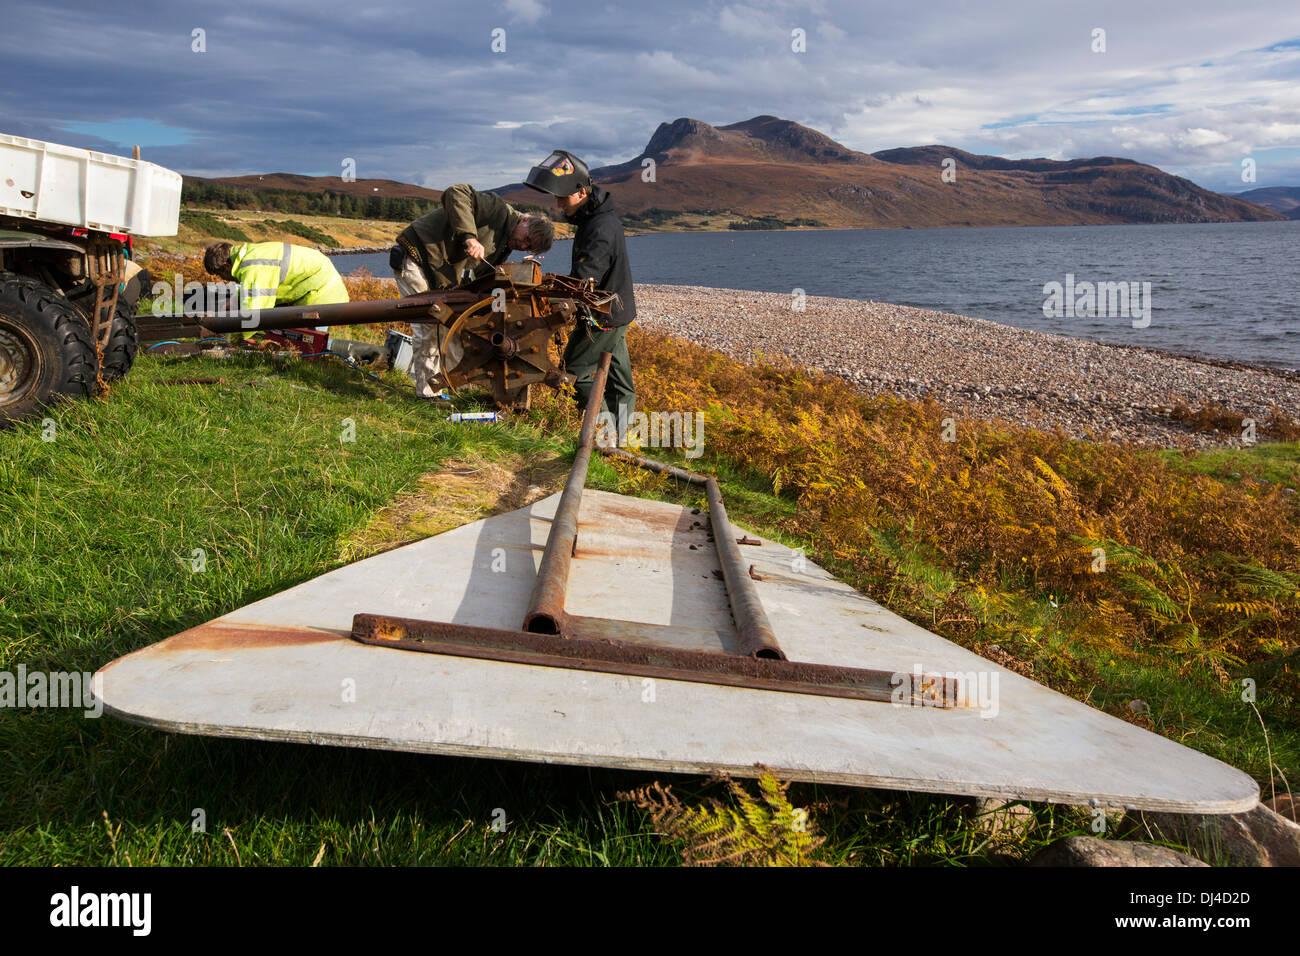 Hugh Piggott doing maintenance on his home made wind turbines in Scoraig, in NW Scotland, a remote off grid, communitiy, UK - Stock Image